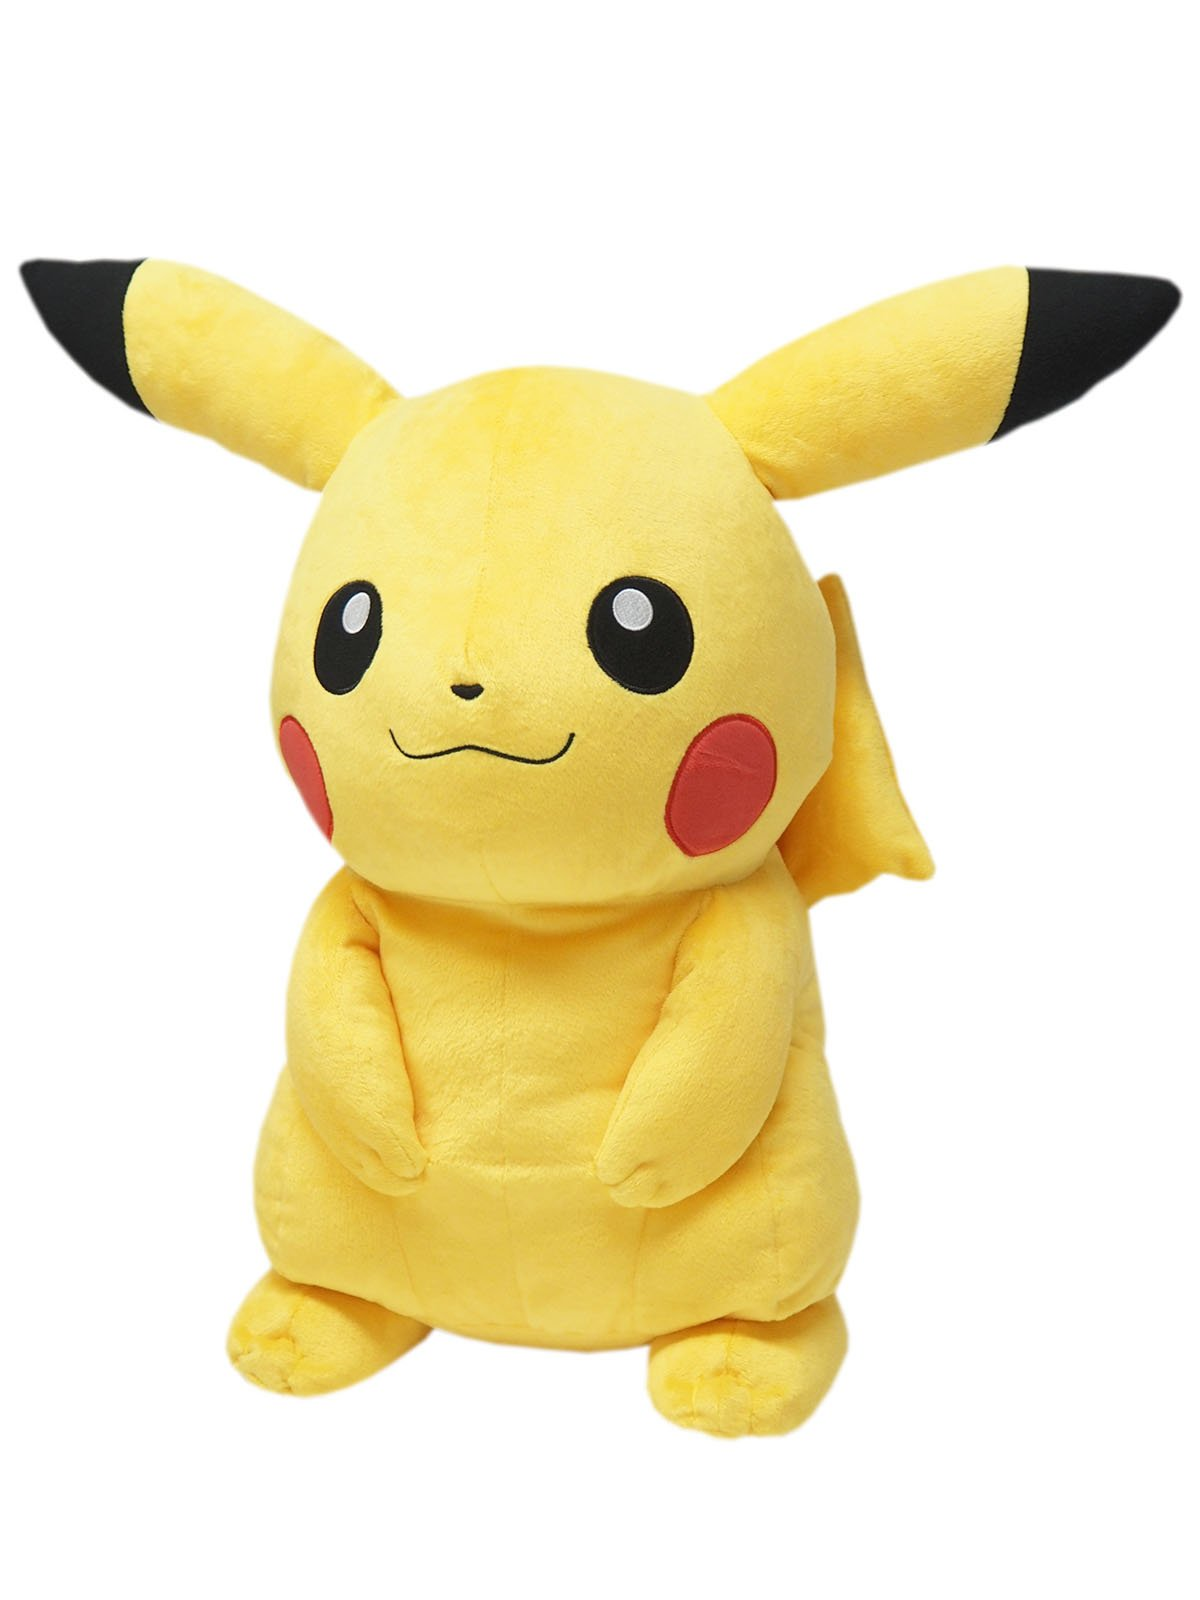 Sanei Pokemon All Star Series PP53-Pikachu Plush, 18''/Large by Sanei